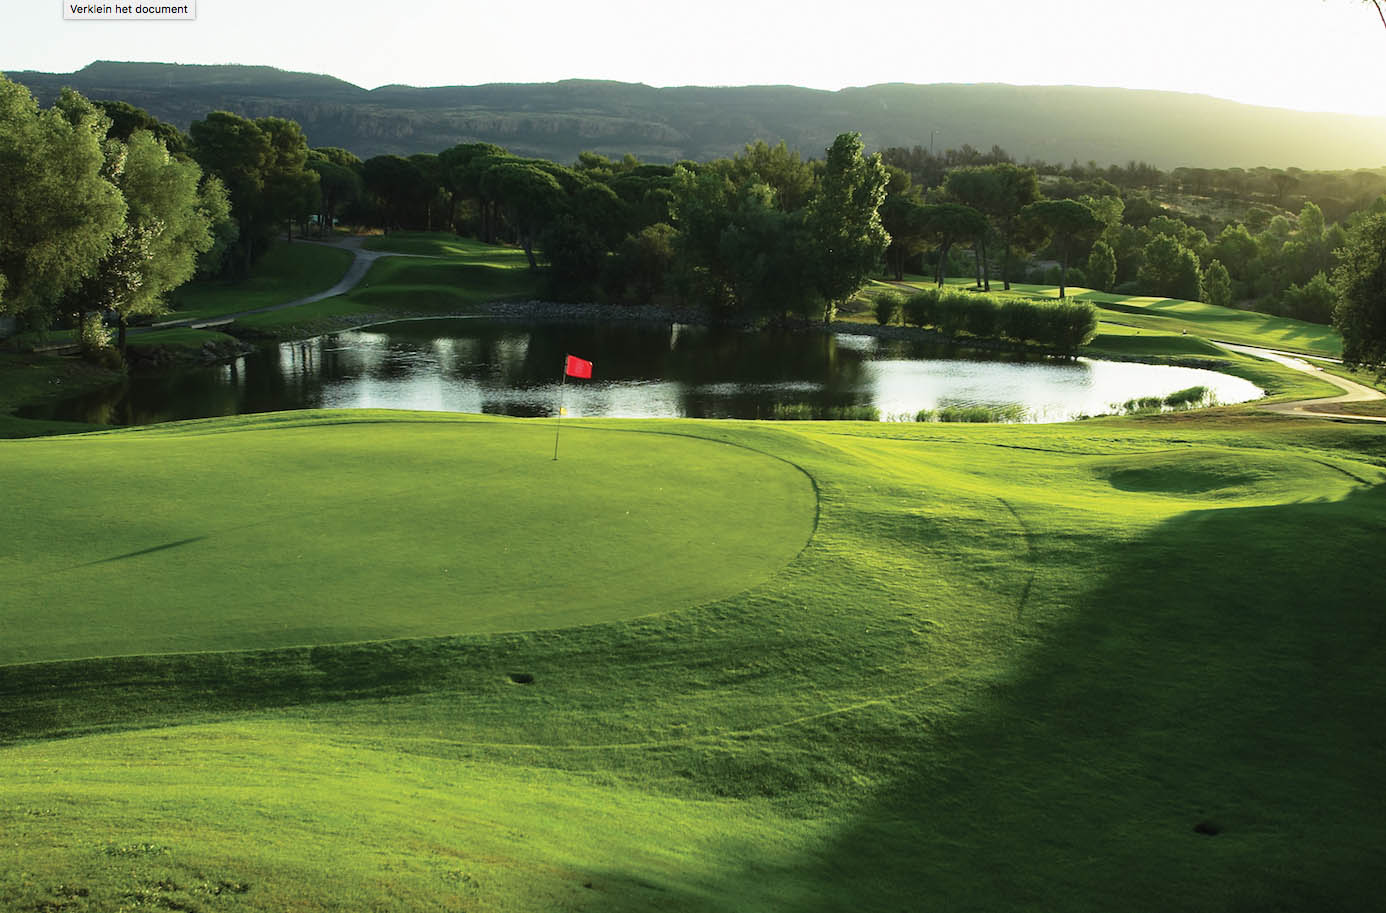 golf-expedition-golf-reizen-frankrijk-regio-cote-d'azur-Les-Domaines-de-Saint-Endréol-Golf-en-Spa-Resort-golfbaan-green